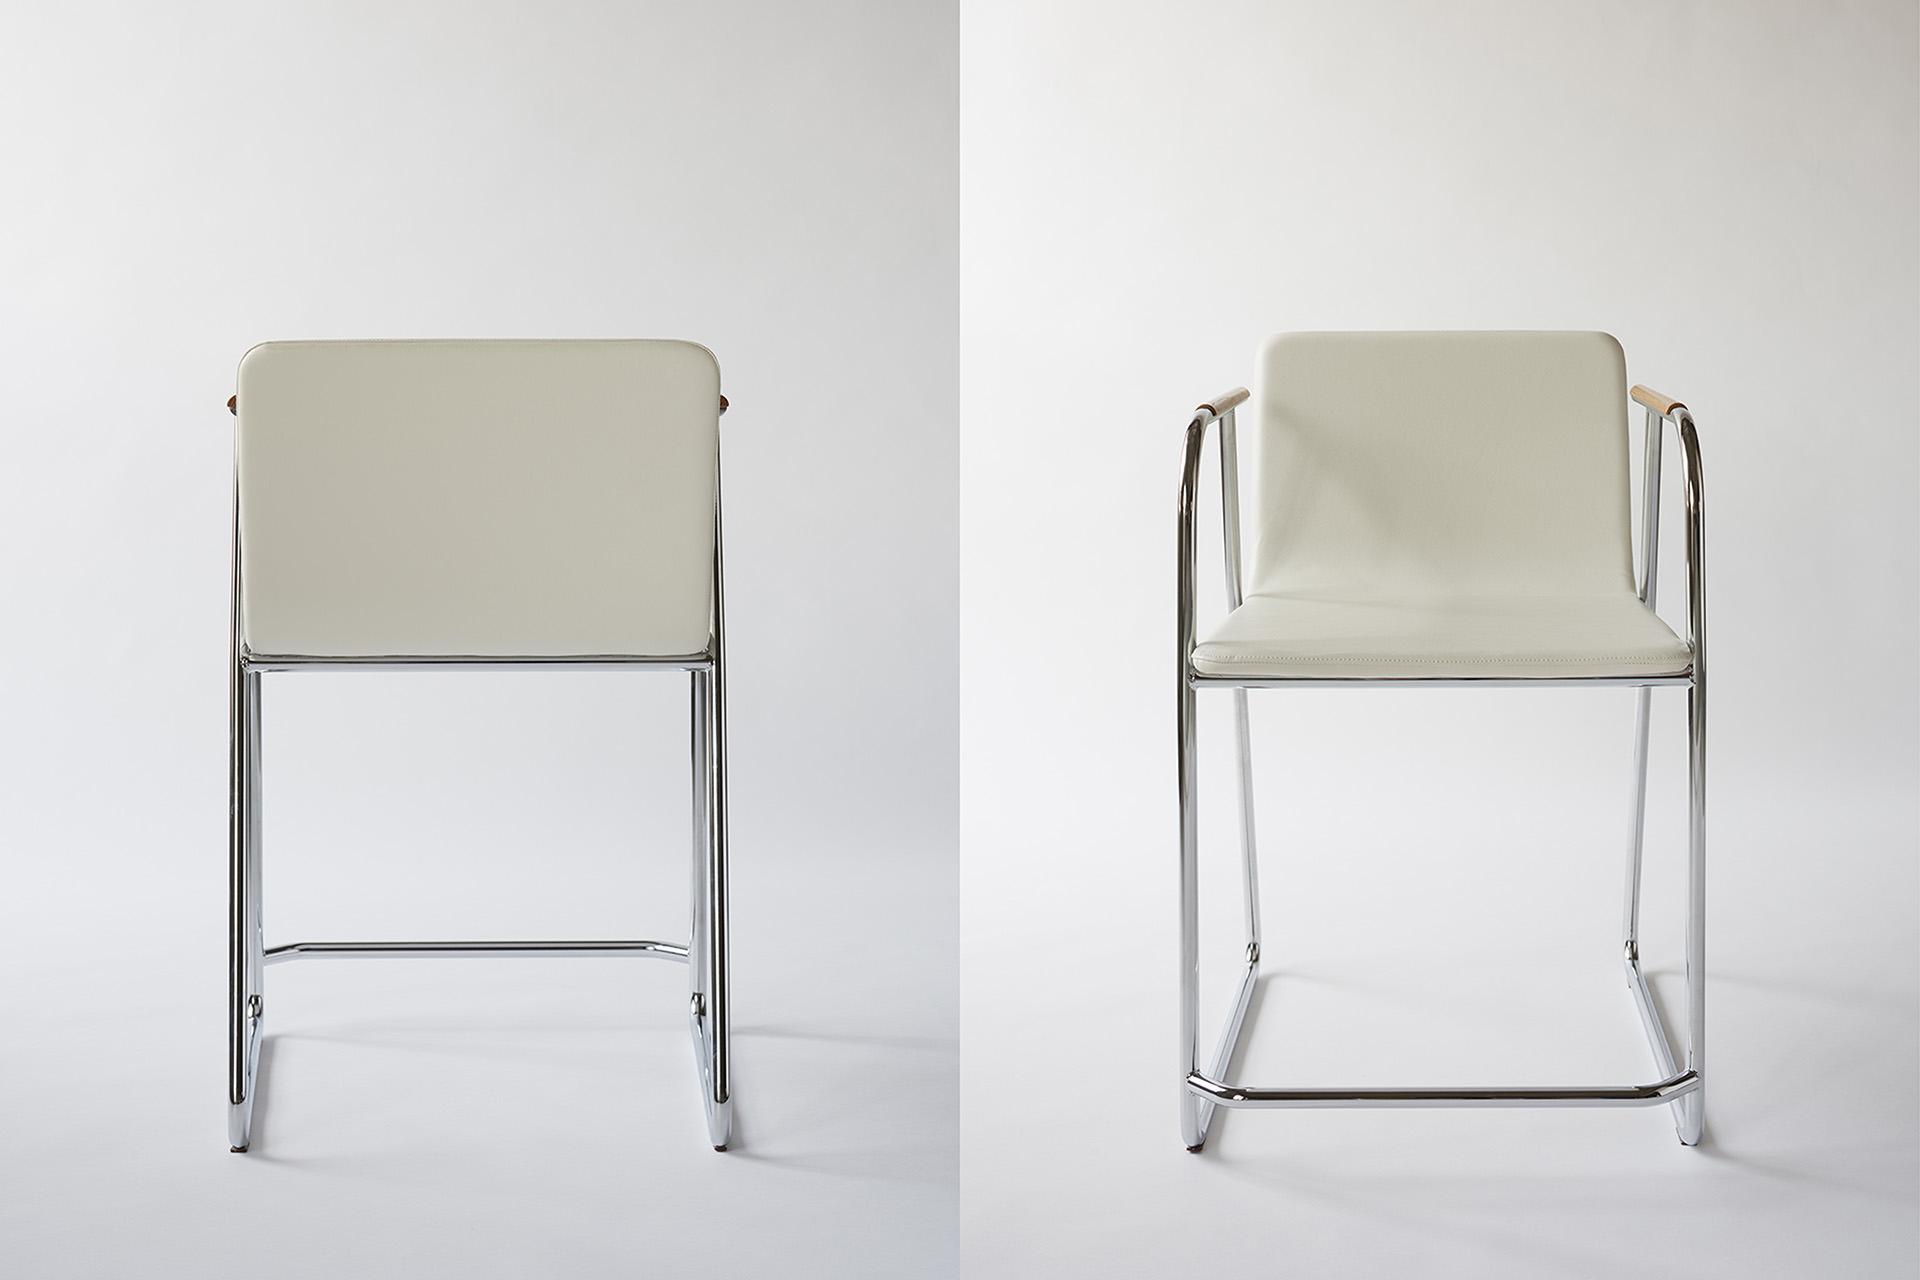 Halb Chair